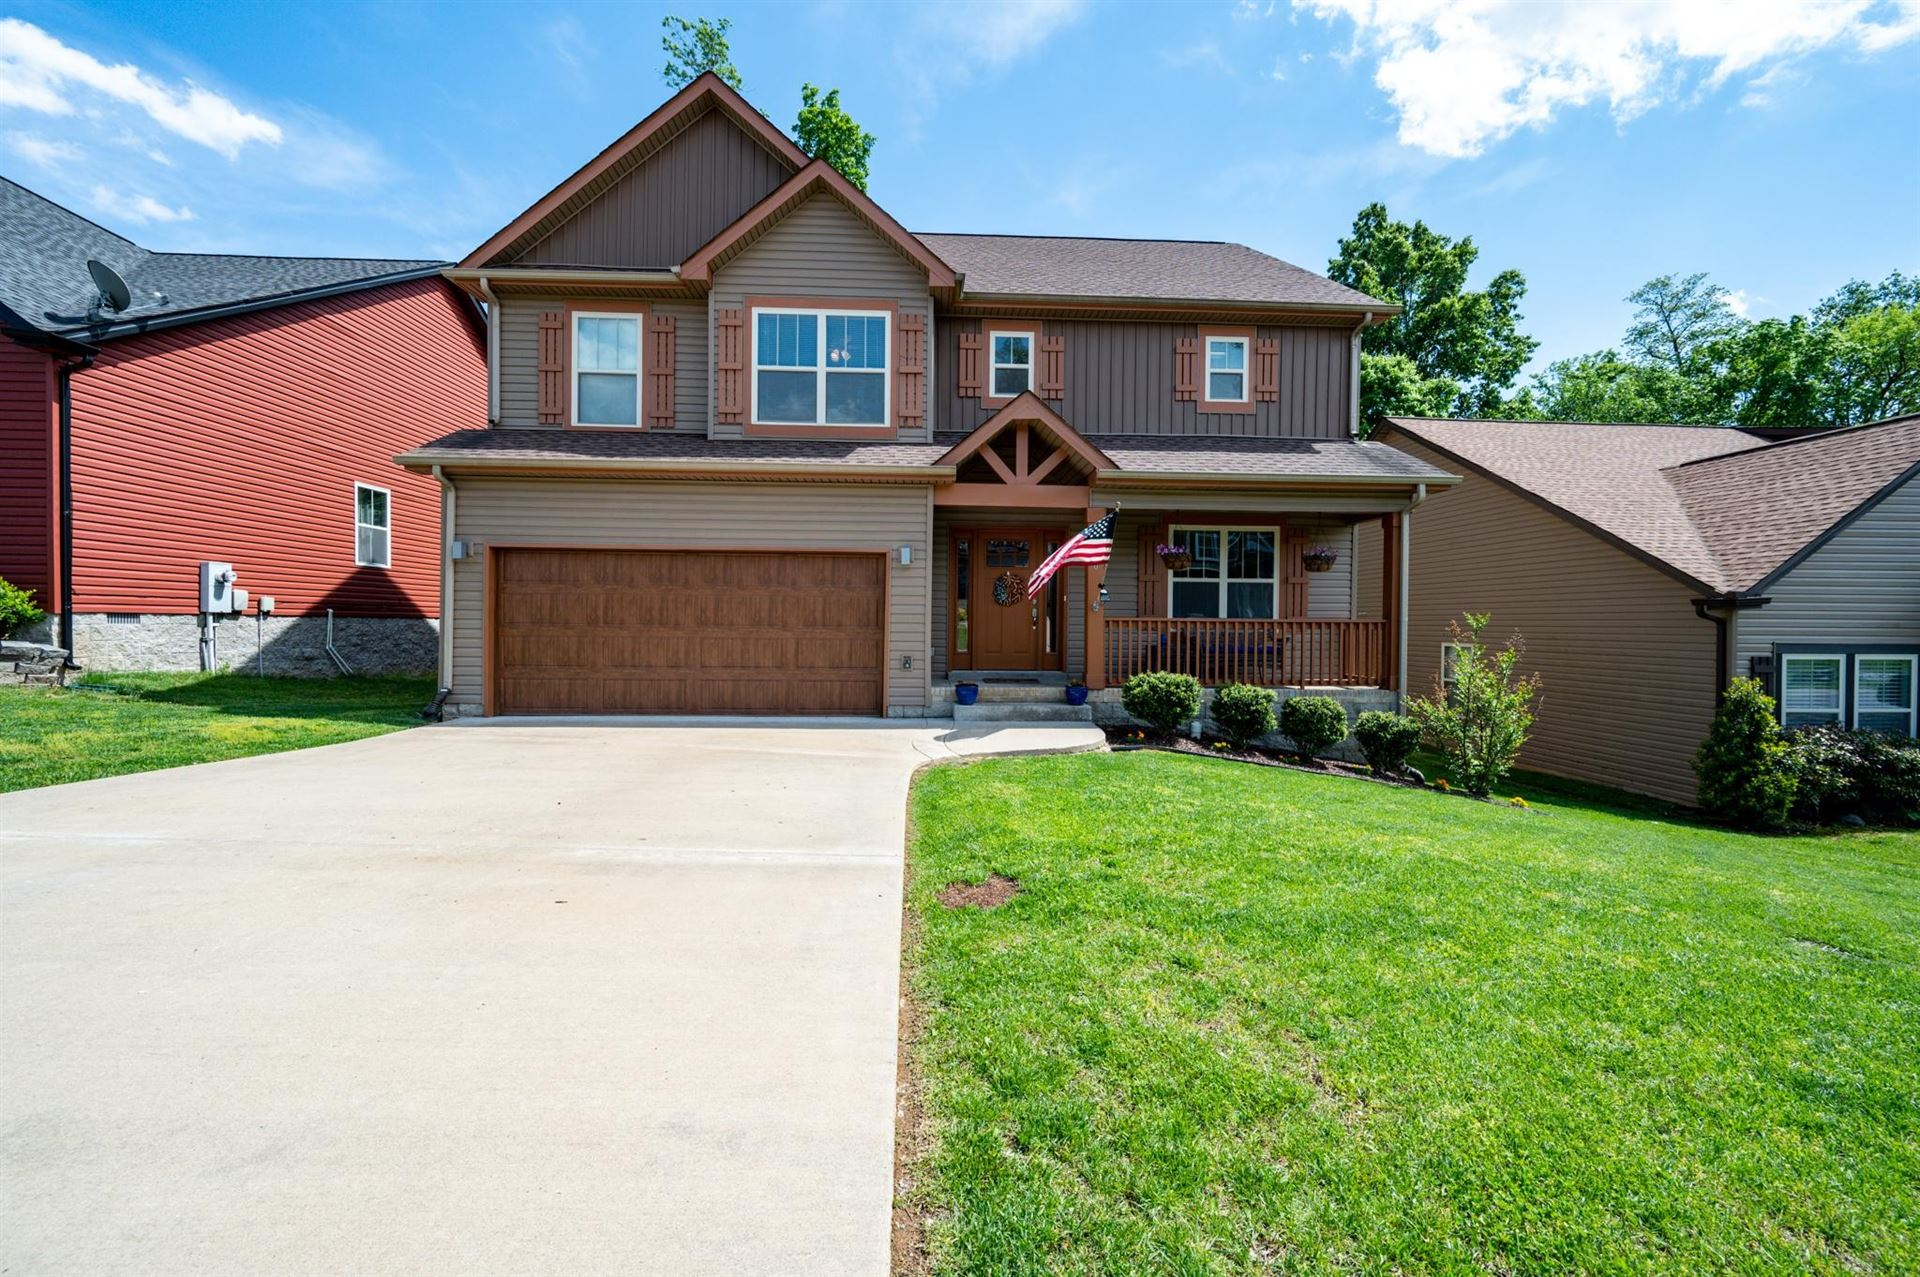 1180 Eagles Bluff Dr, Clarksville, TN 37040 - MLS#: 2253157